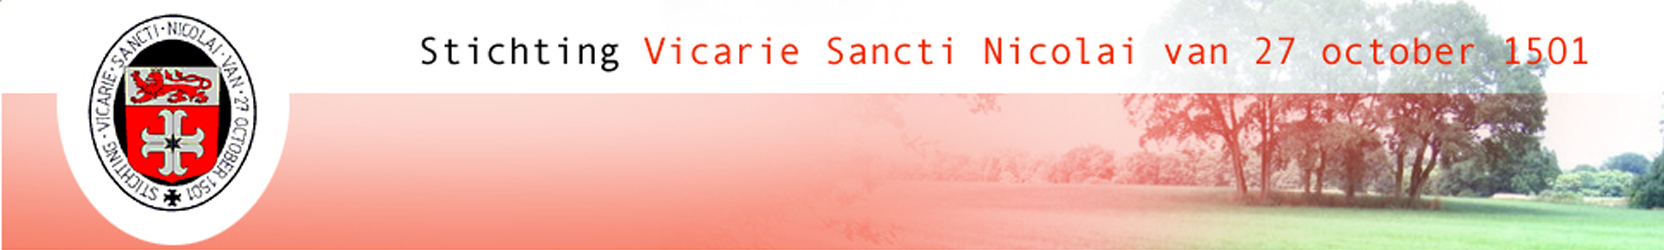 Vicarie Sancti Nicolai Foundation